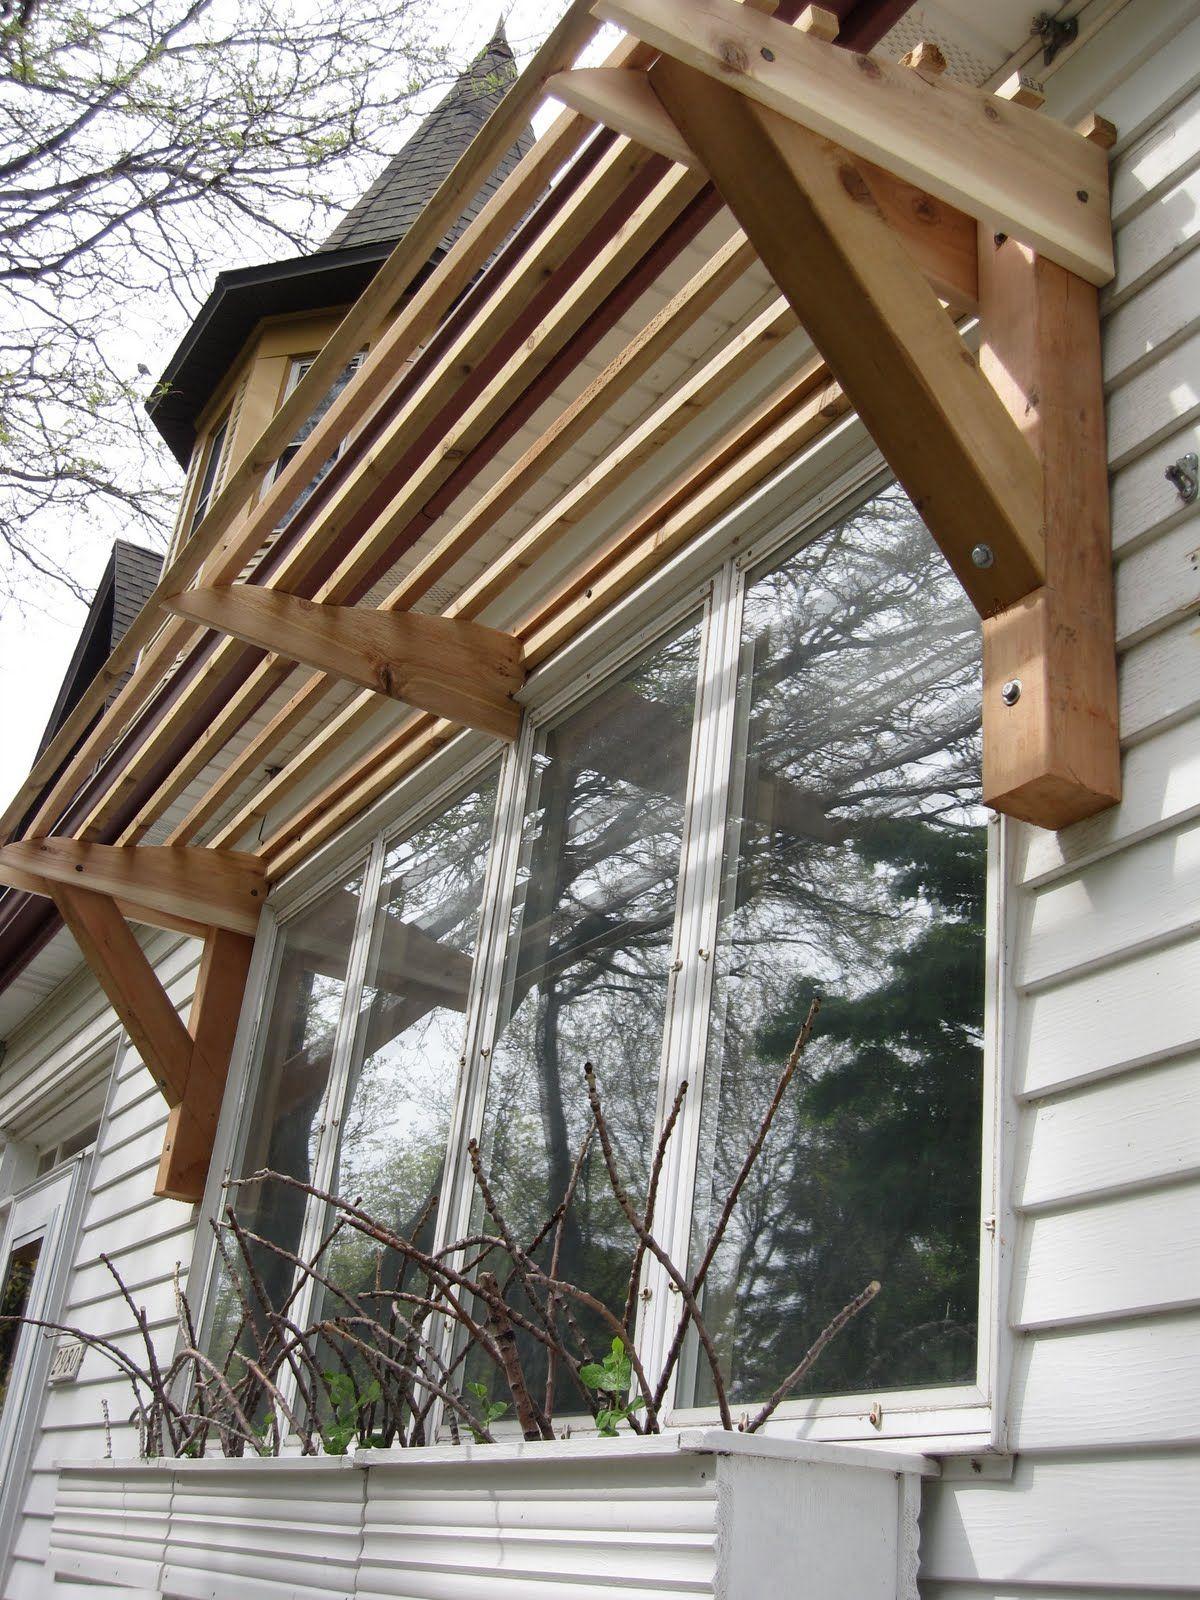 Horizontal Slat Awning (all wood) | House ideas ...